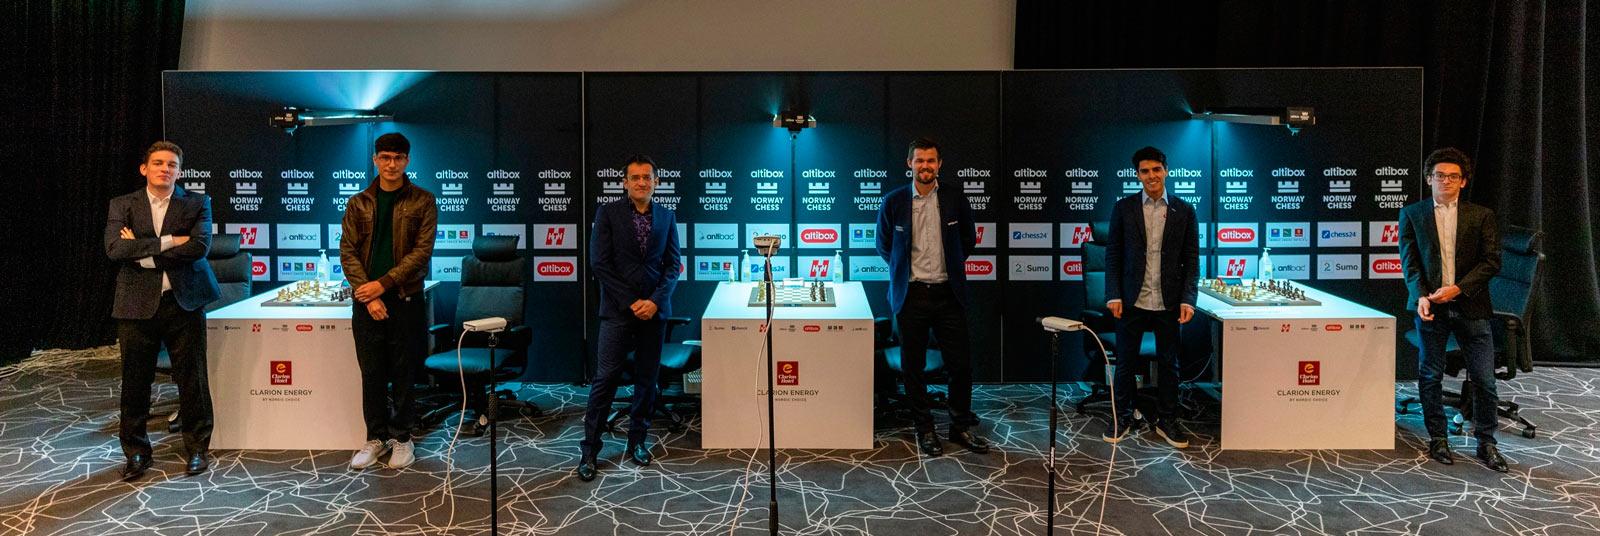 Участники шахматного турнира Altibox Norway Chess 2020 (Ставангер, Норвегия)